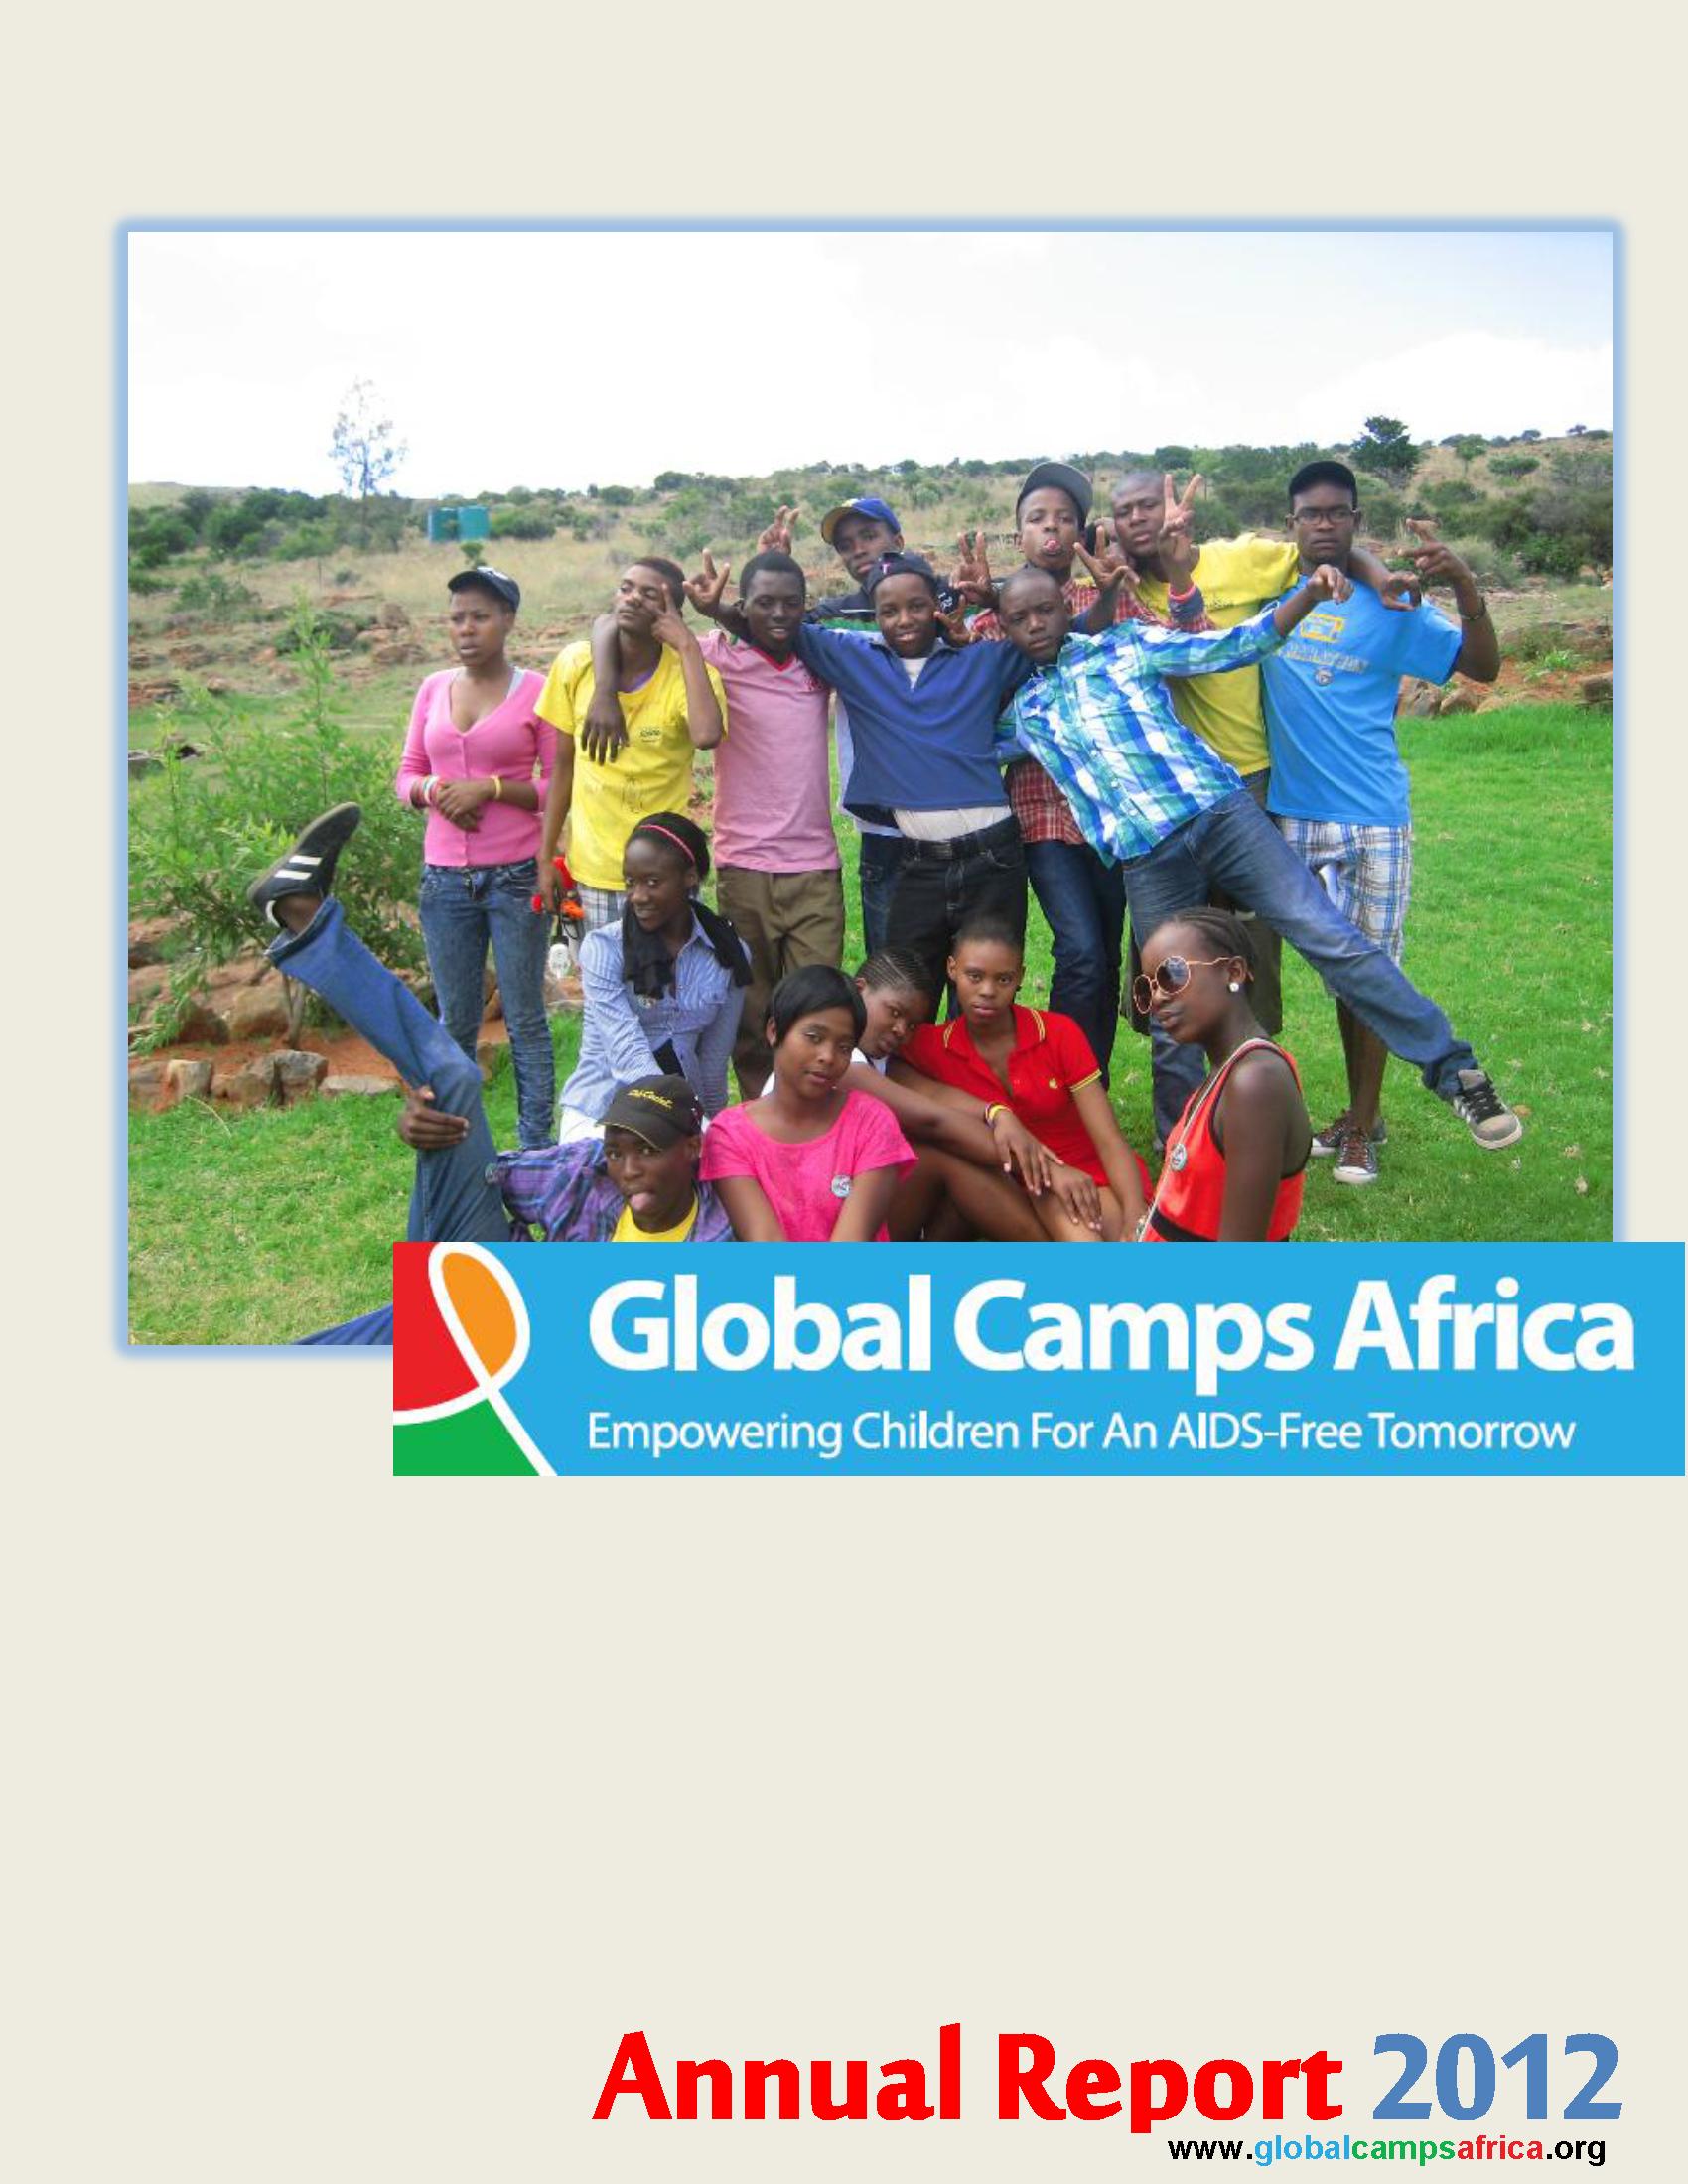 2012 GCA_Annual_Report_FINAL 1.28.14 (1) 1.png